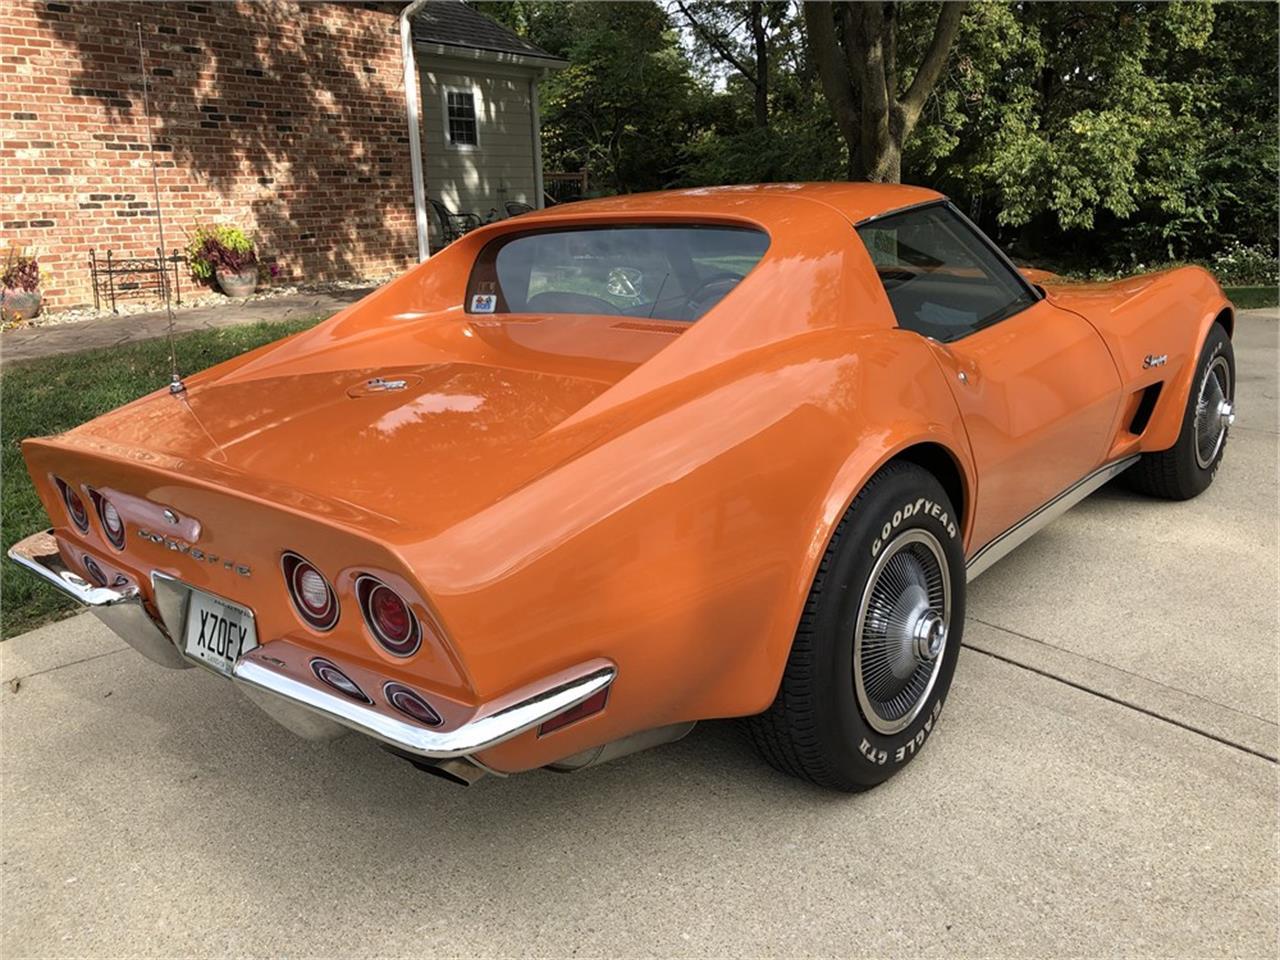 1973 Chevrolet Corvette (CC-1412231) for sale in Edwardville, Alabama